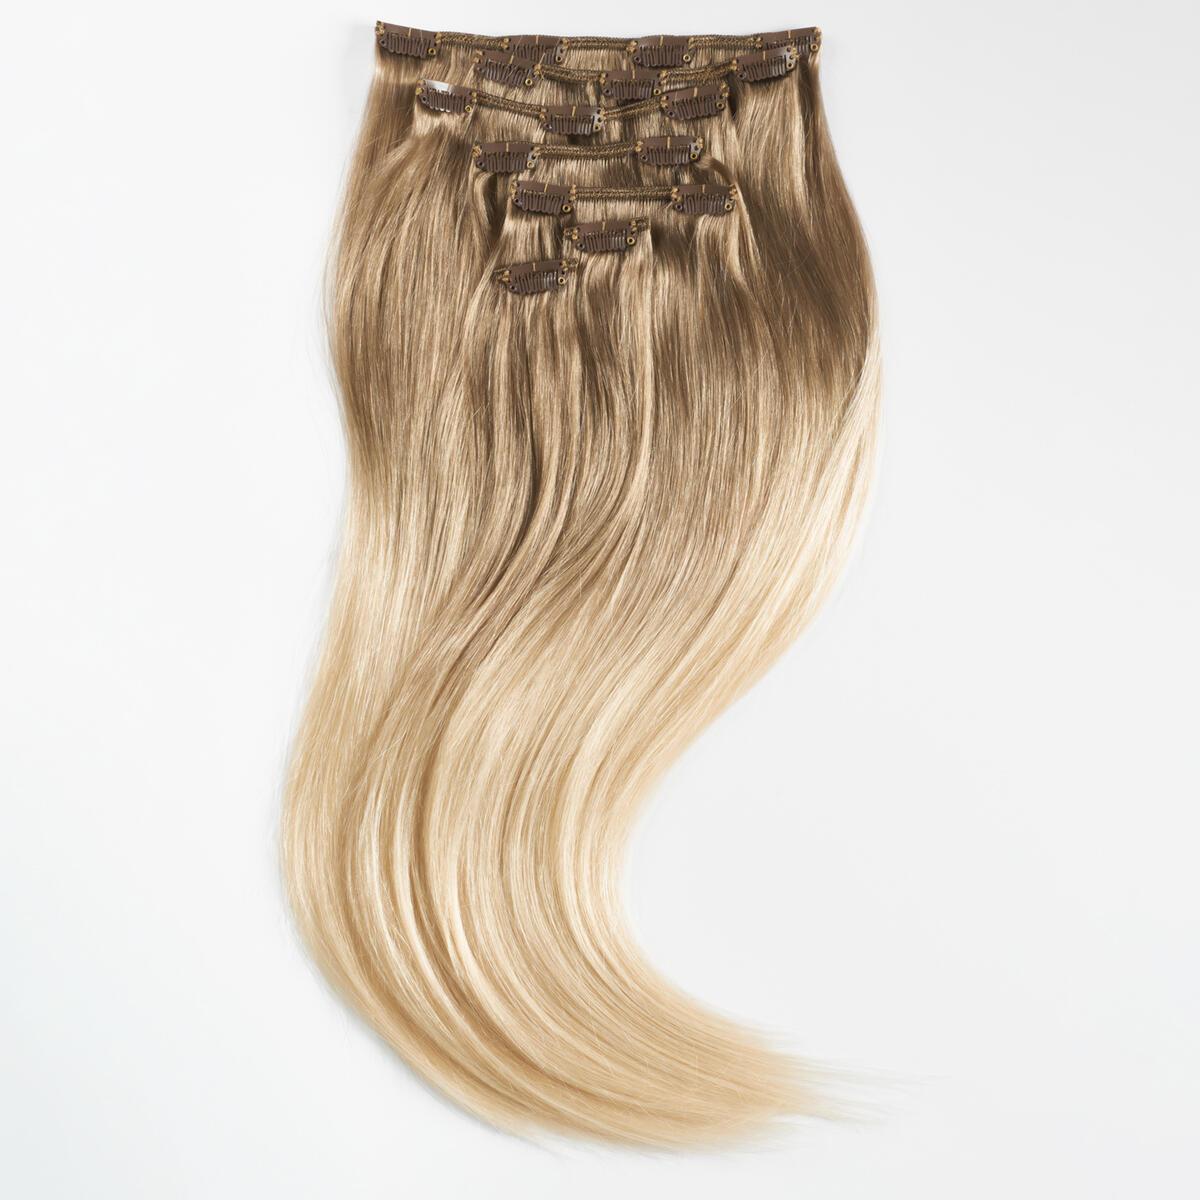 Clip-on set O7.3/10.8 Cendre Ash Blond Ombre 50 cm